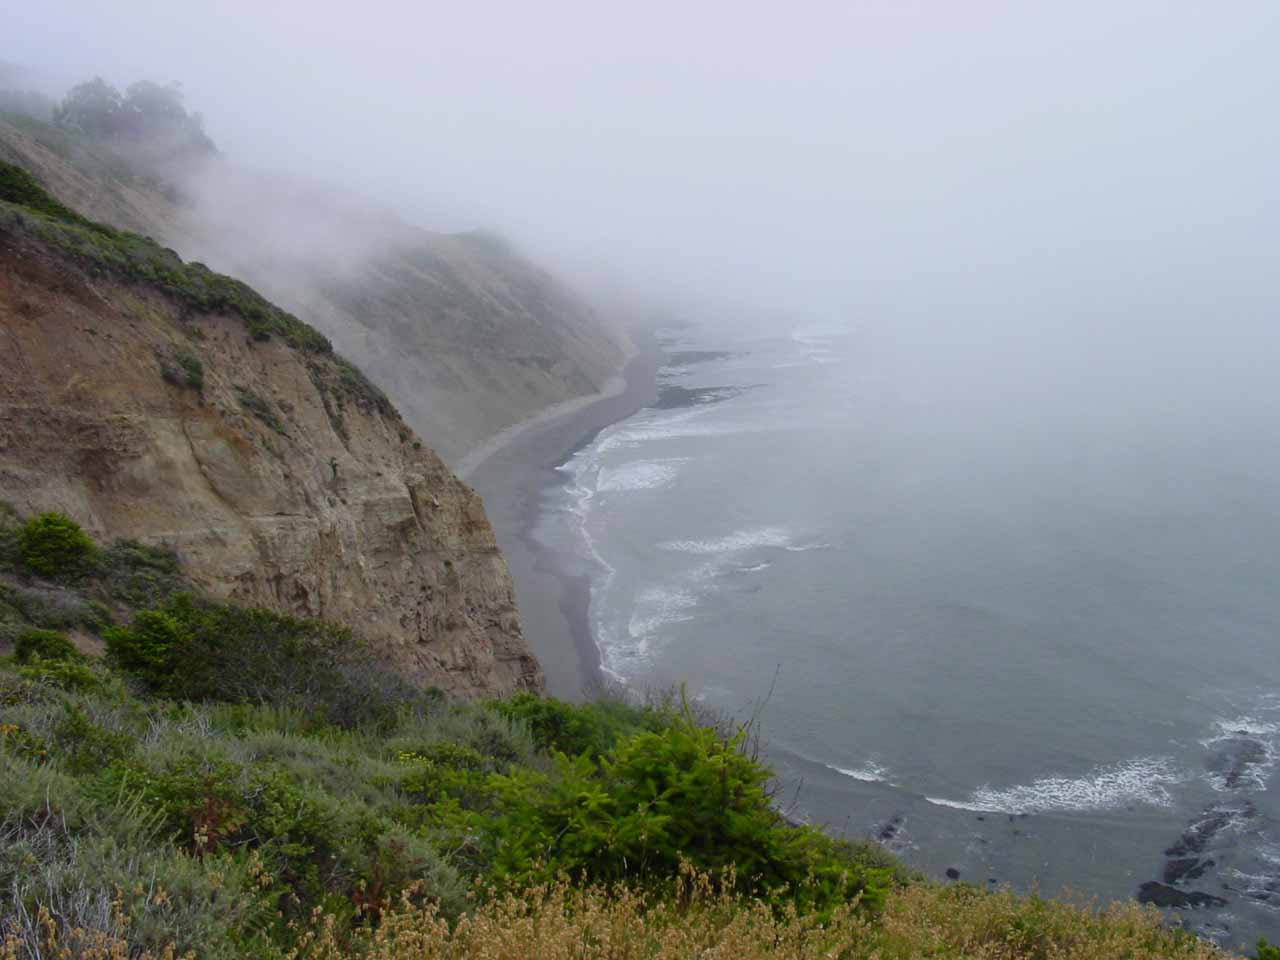 Still foggy along the coast as we got closer to the trailhead